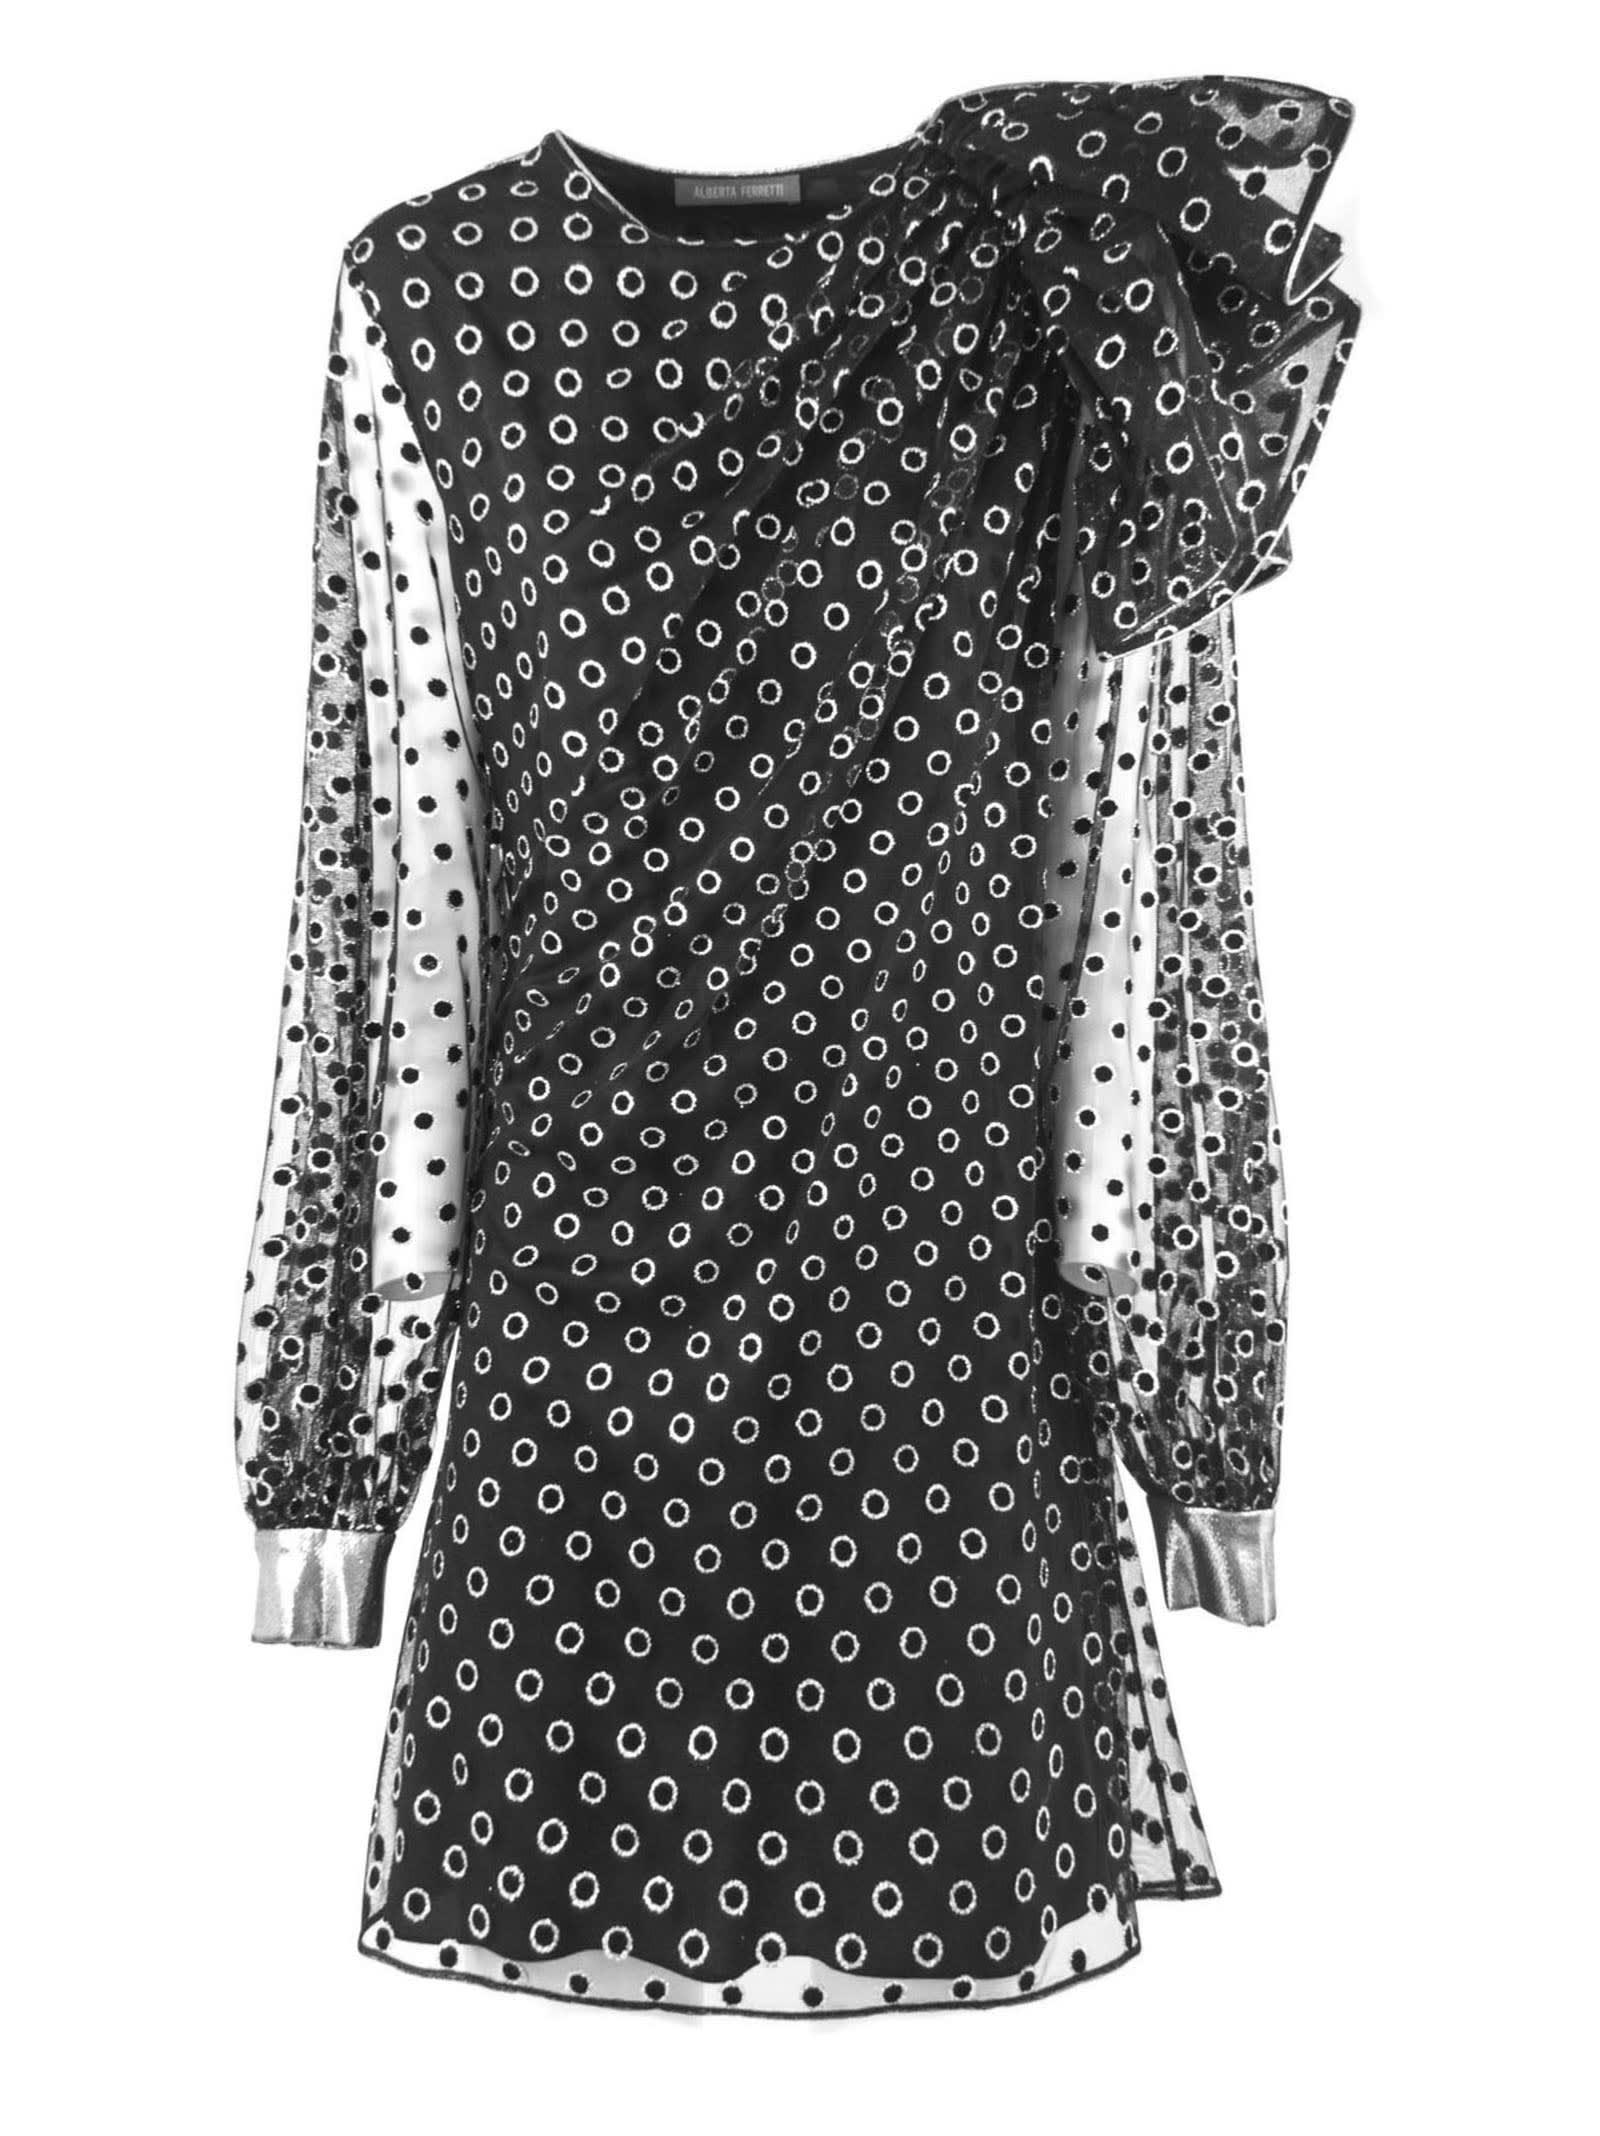 Alberta Ferretti Dress In Black Fabric